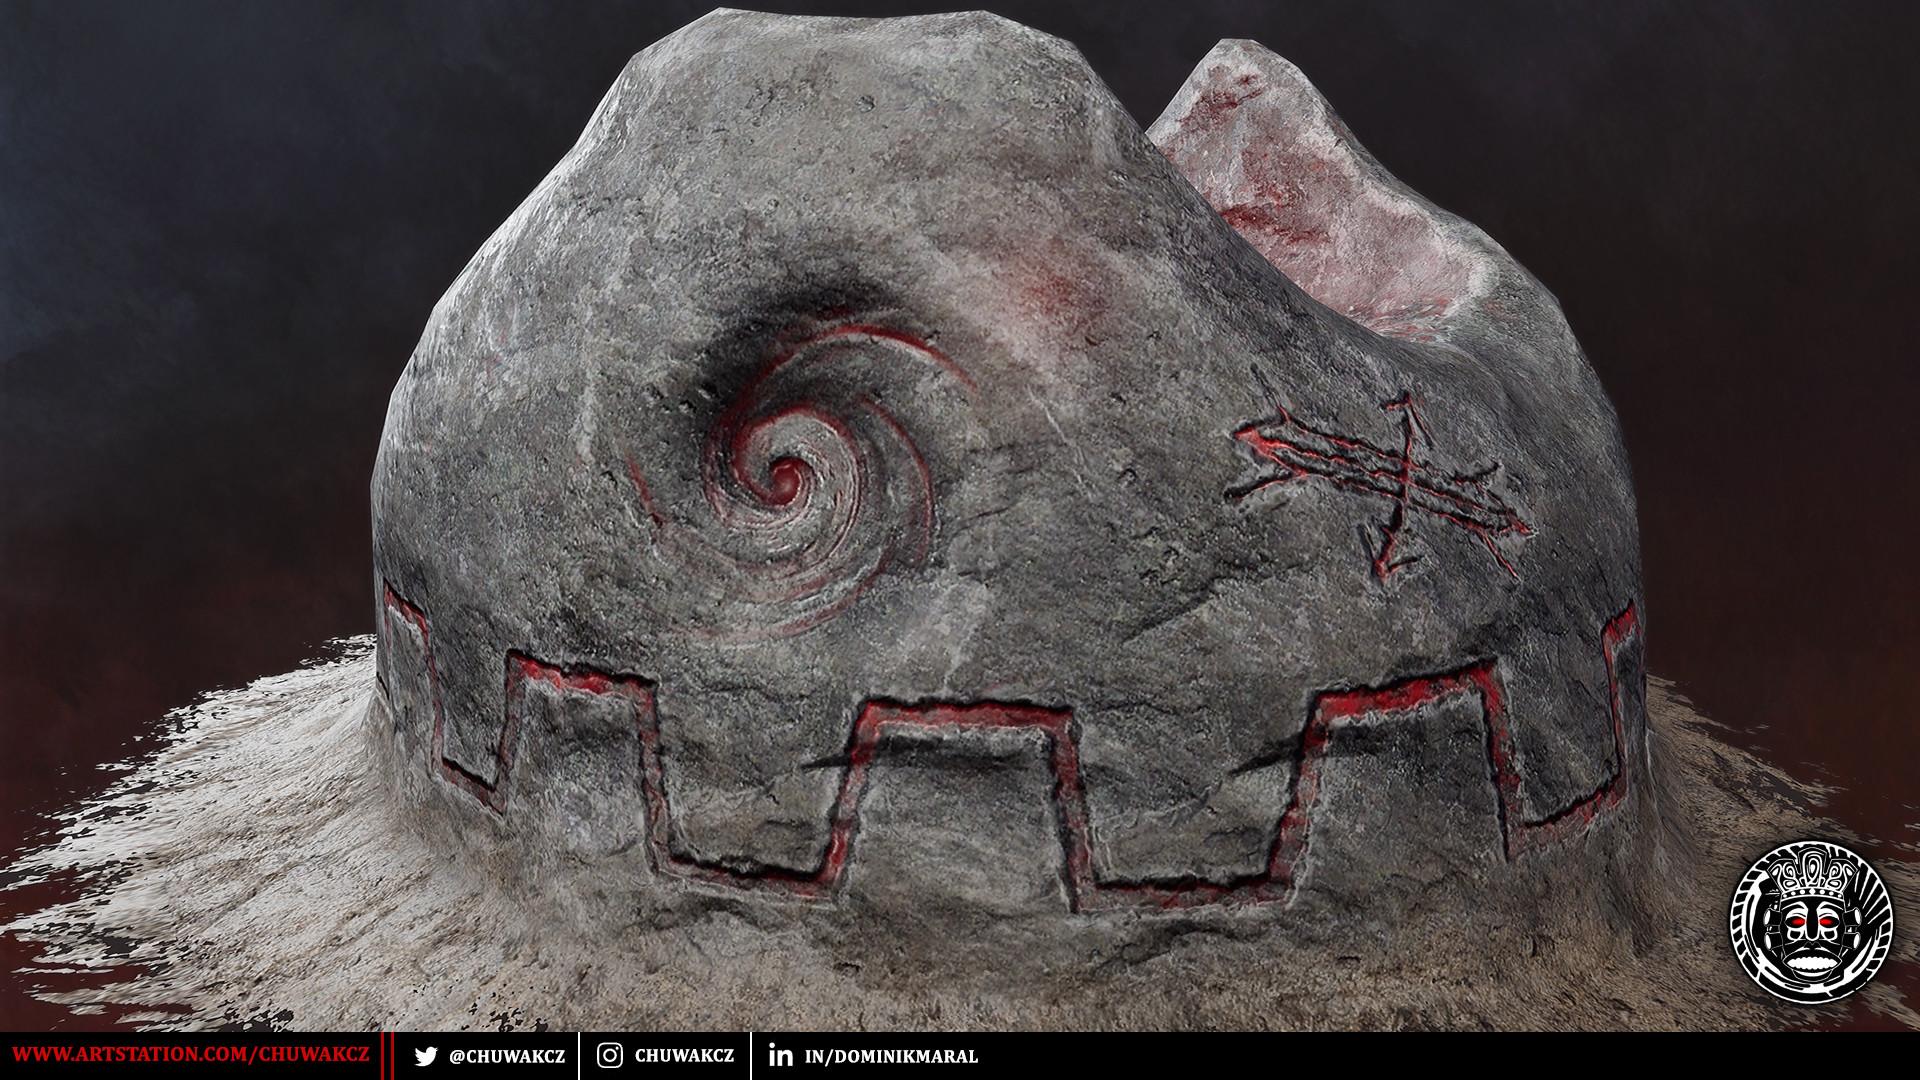 Dominik maral portalpedestalclosedetail